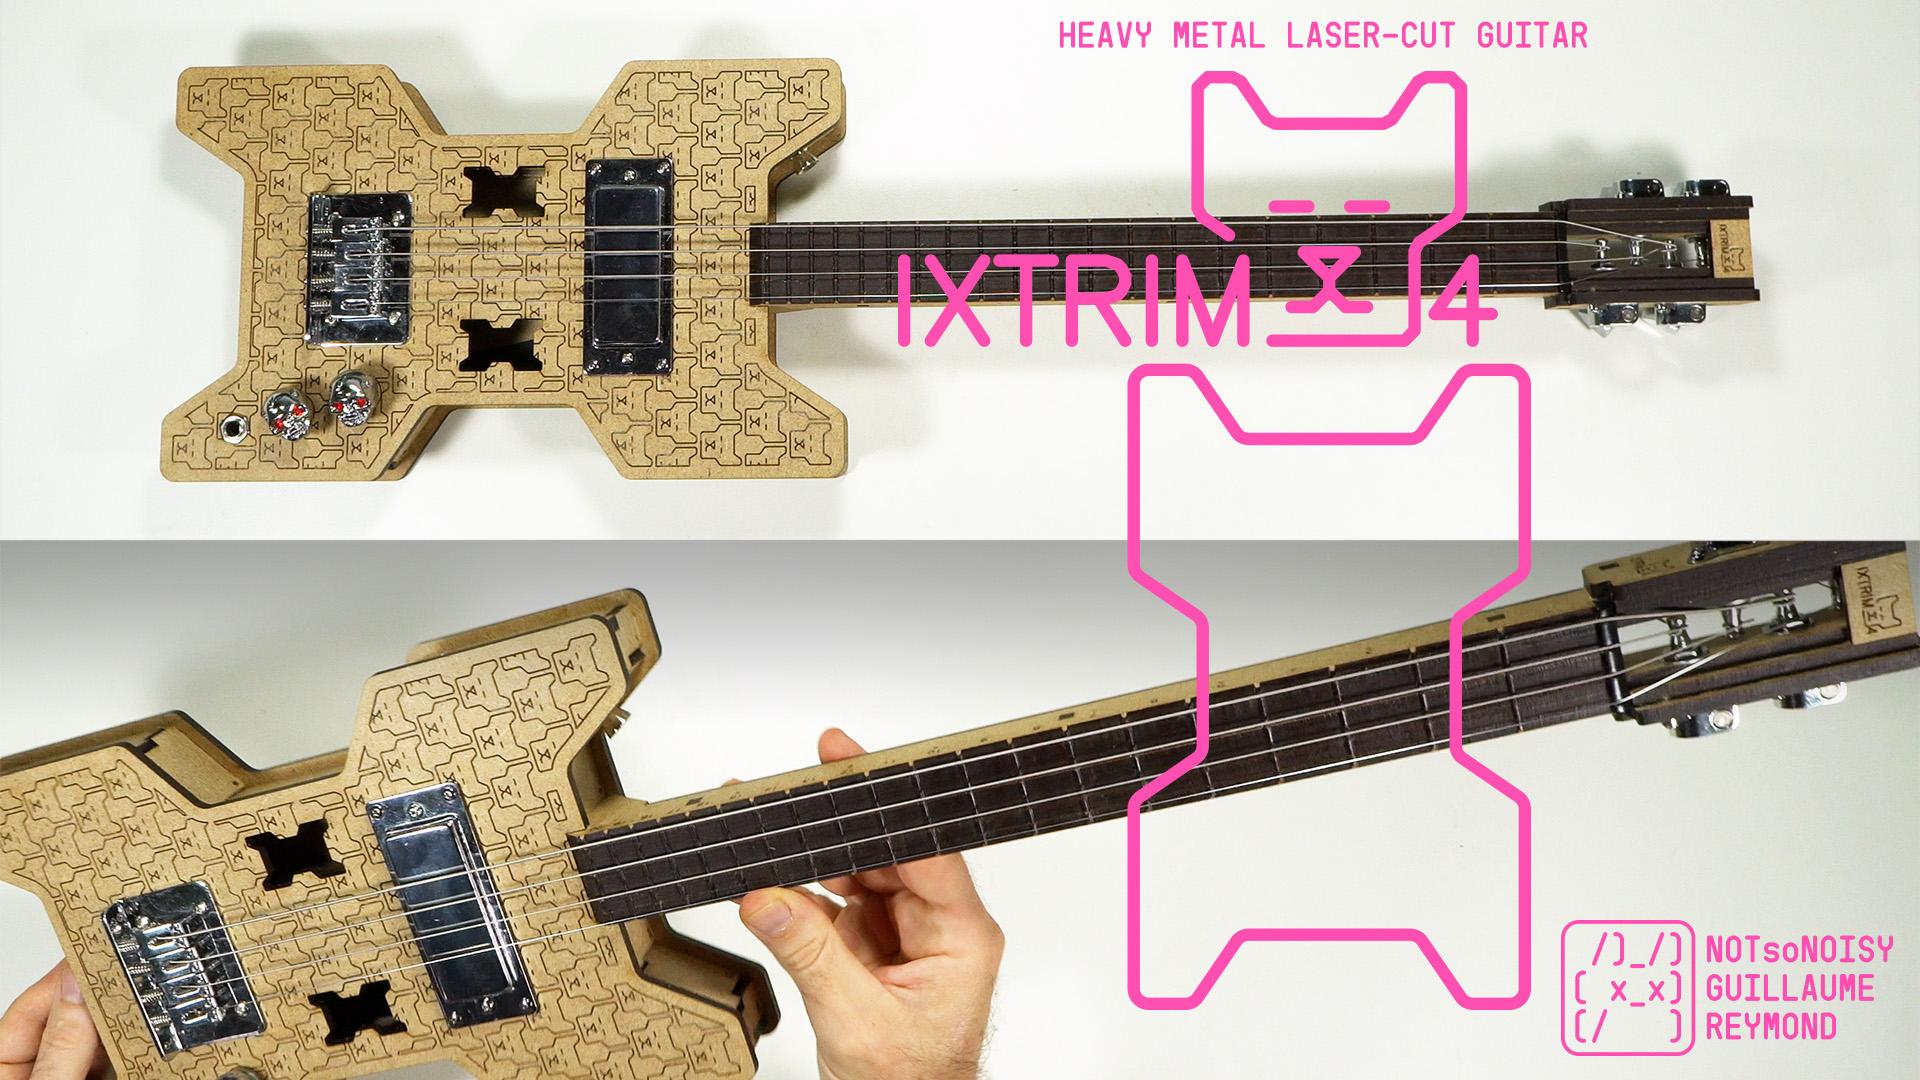 IXTRIM4 laser cut guitar ukulele